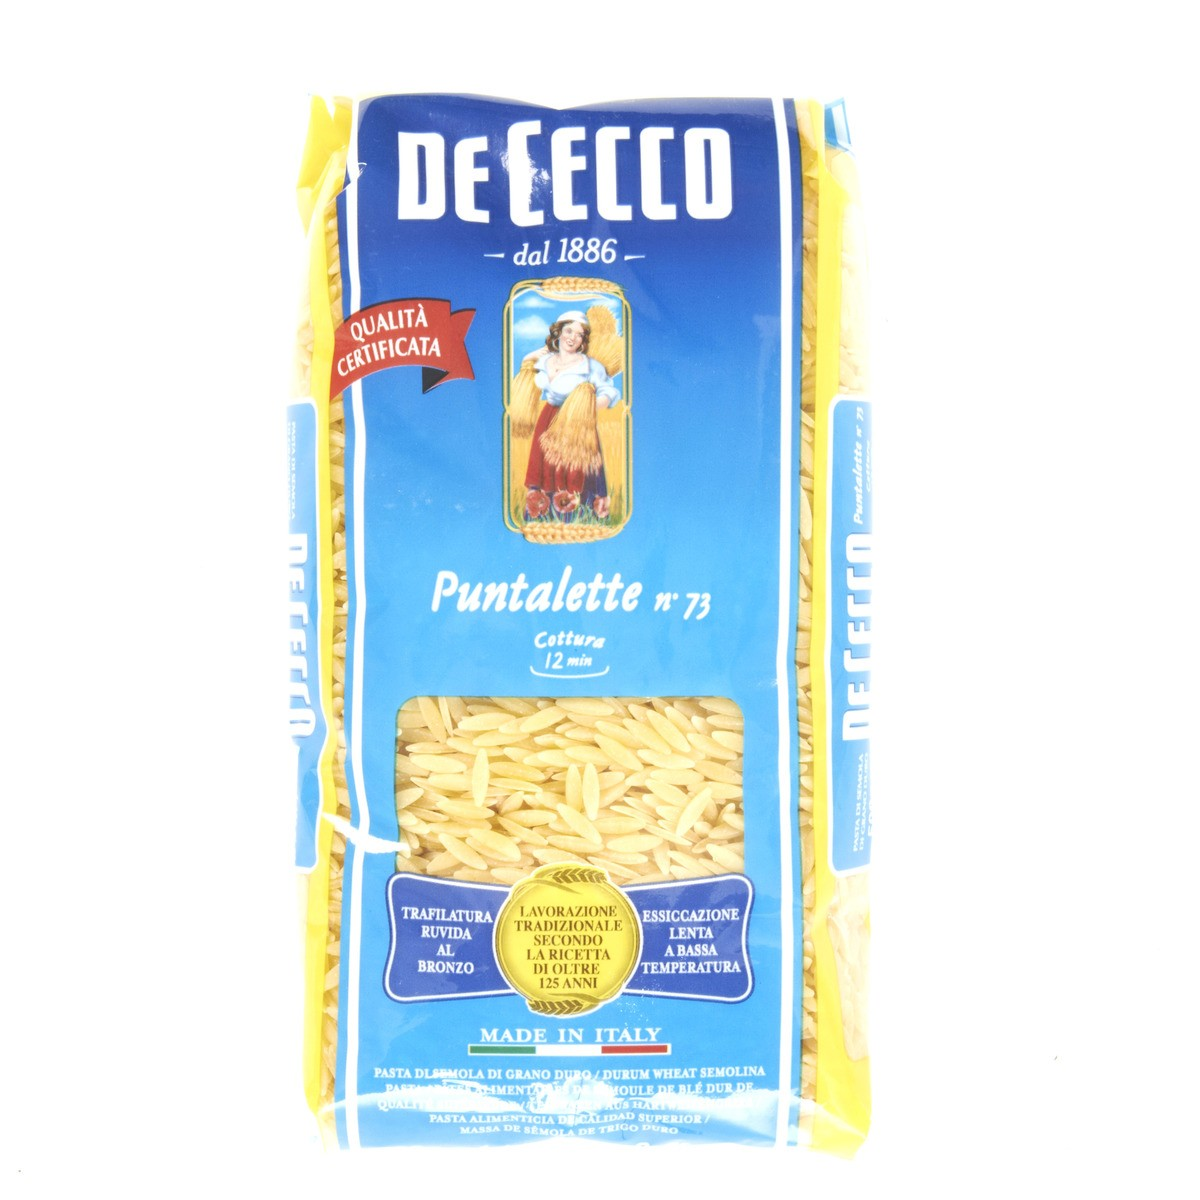 DE CECCO Puntalette n.73